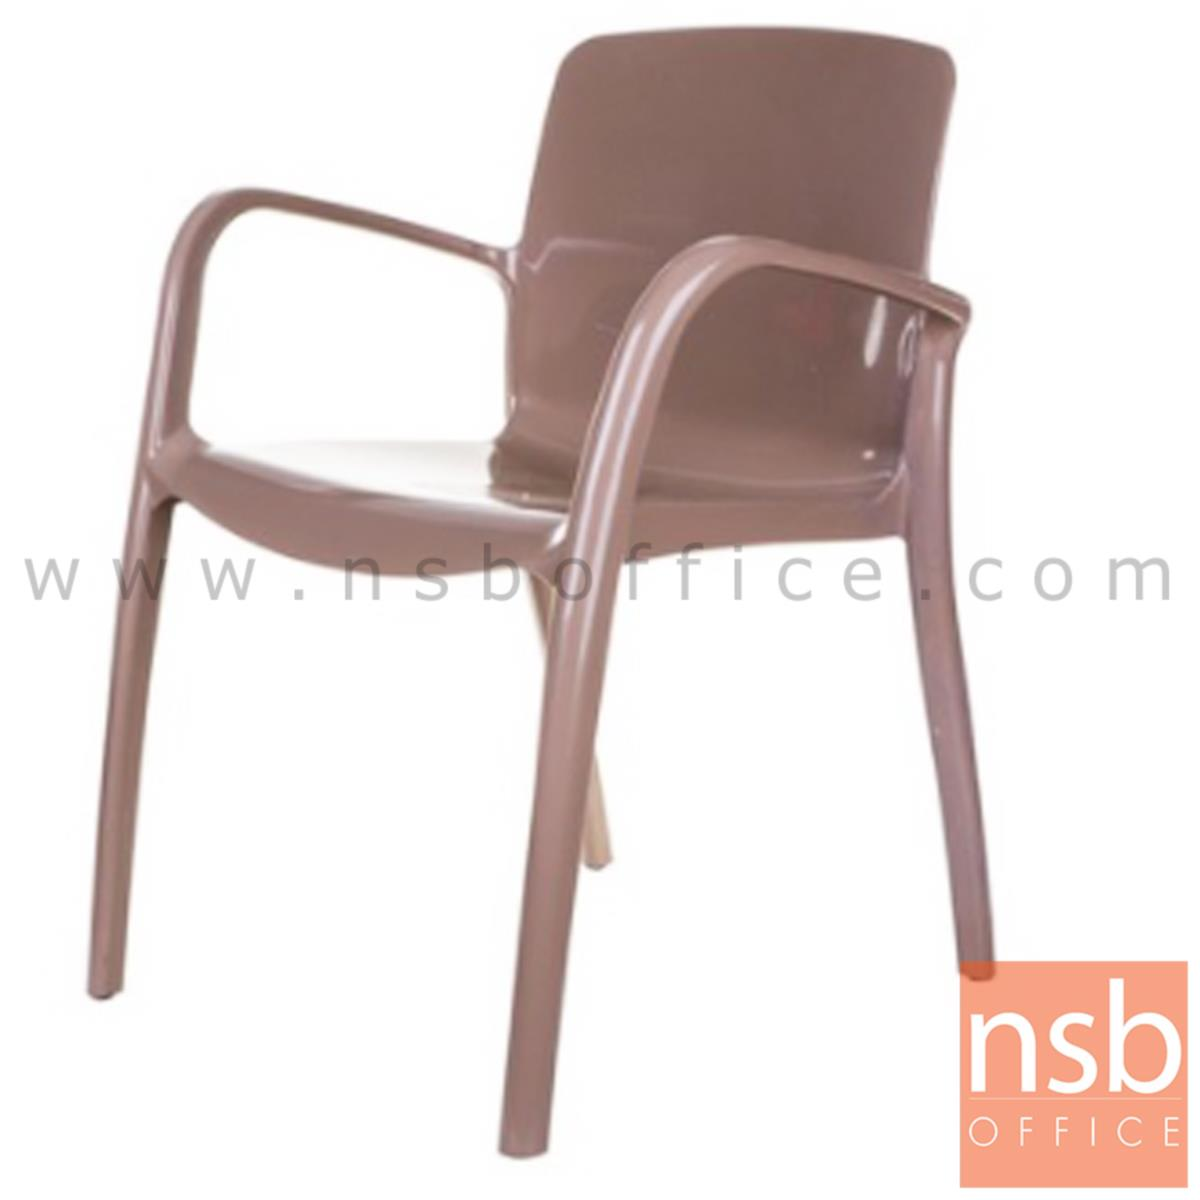 B10A078:เก้าอี้พลาสติก รุ่น CD-PG-03 ขนาด 53W cm. (พลาสติกเกรด A)